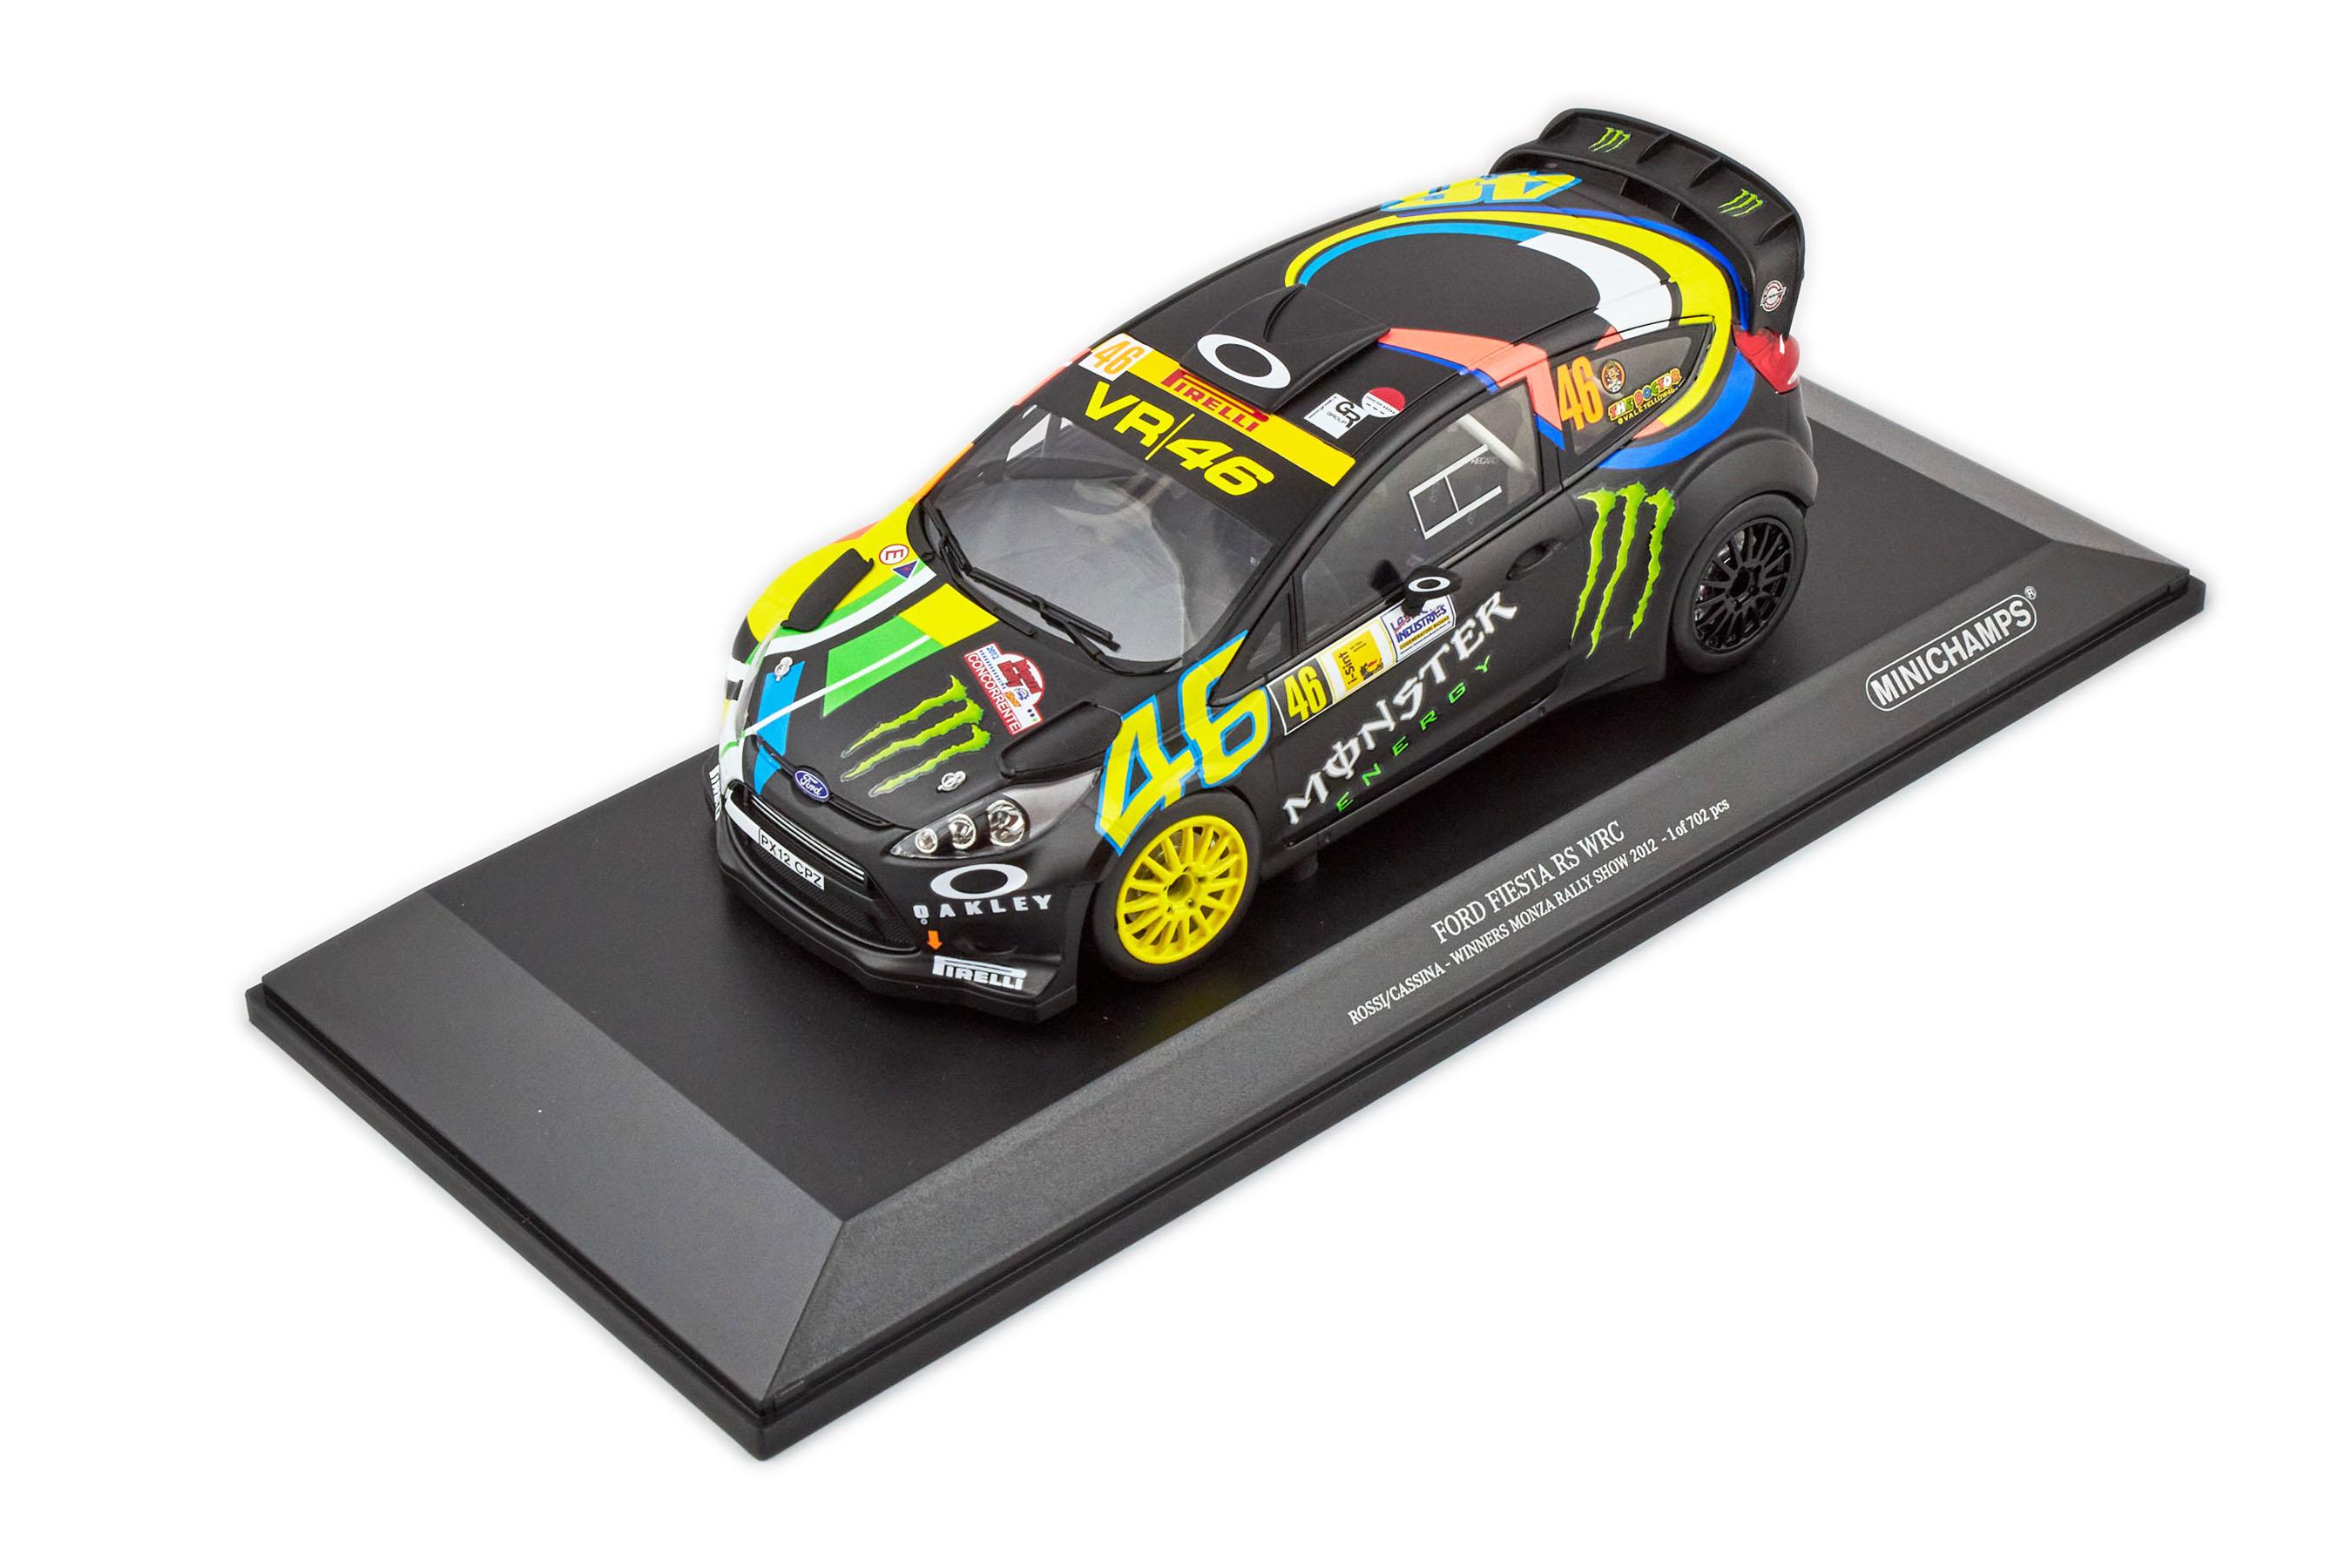 Ford Fiesta Rs Wrc Valentino Rossi VR46 Winner Monza Rally 2012 1/18 Minichamps